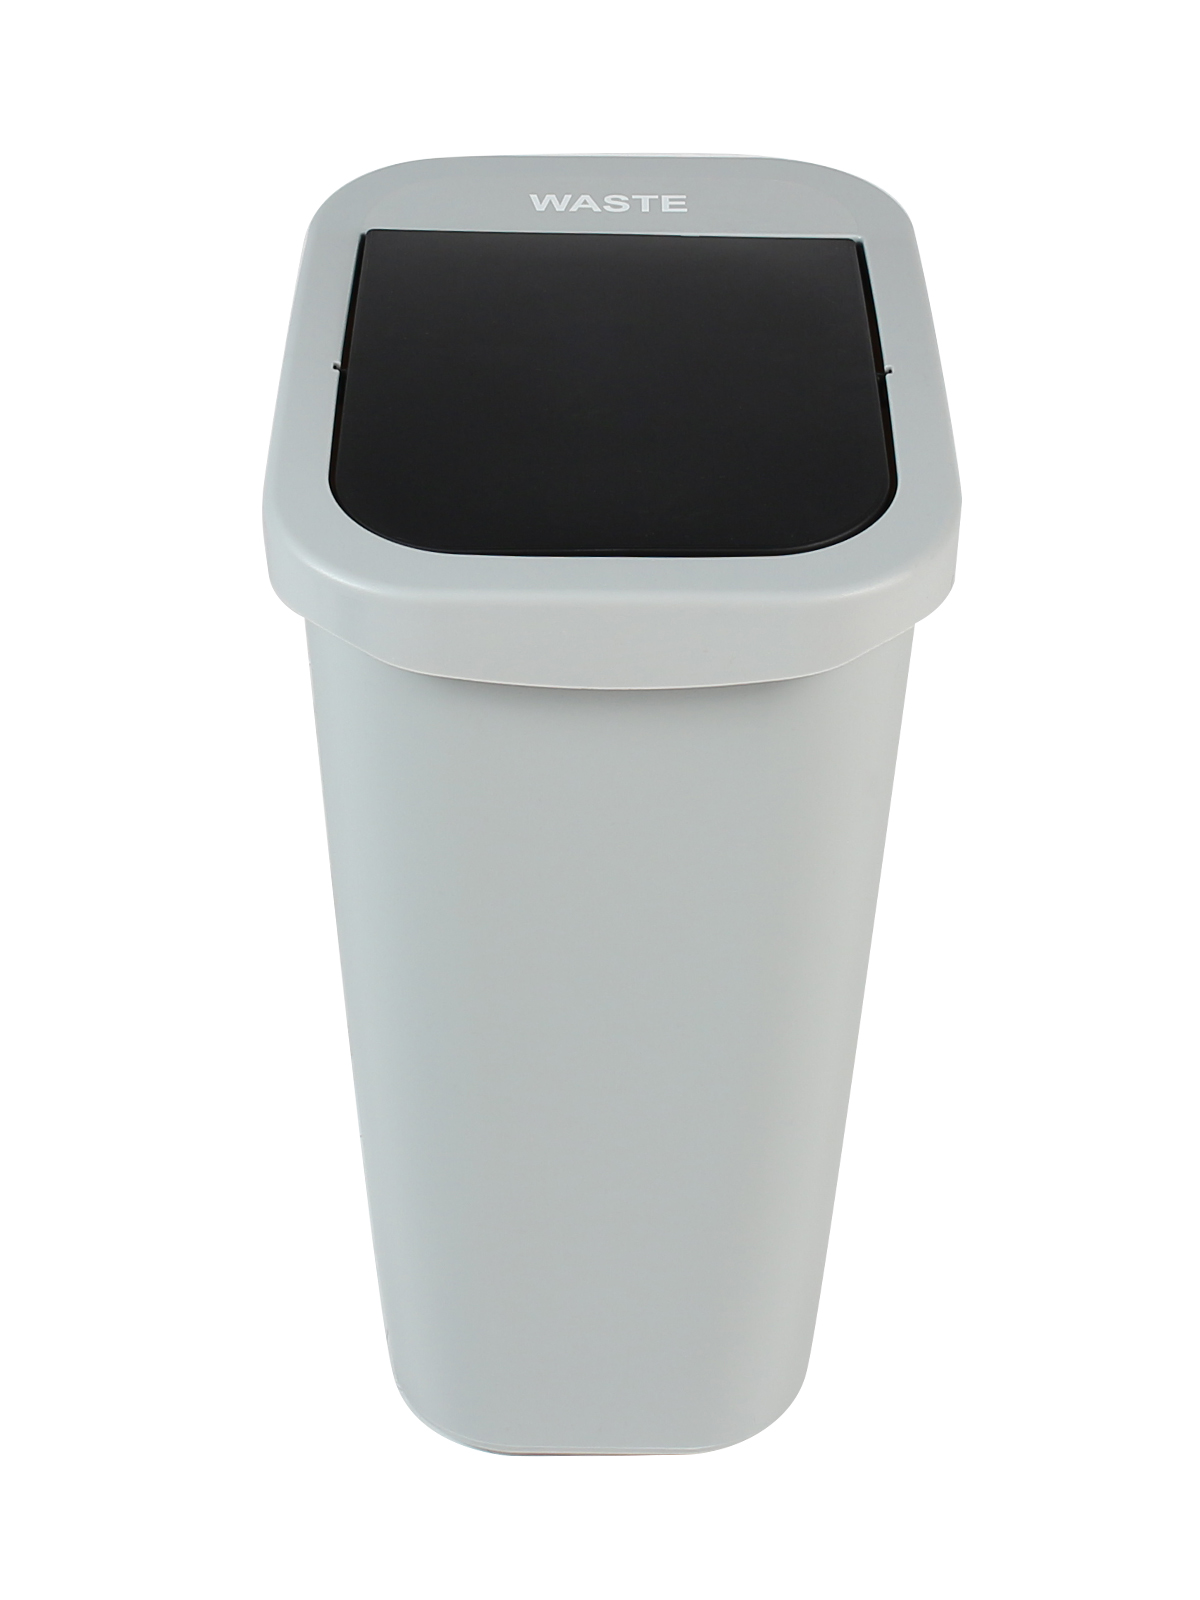 BILLI BOX - Single - 10 G - Waste - Swing - Grey-Black